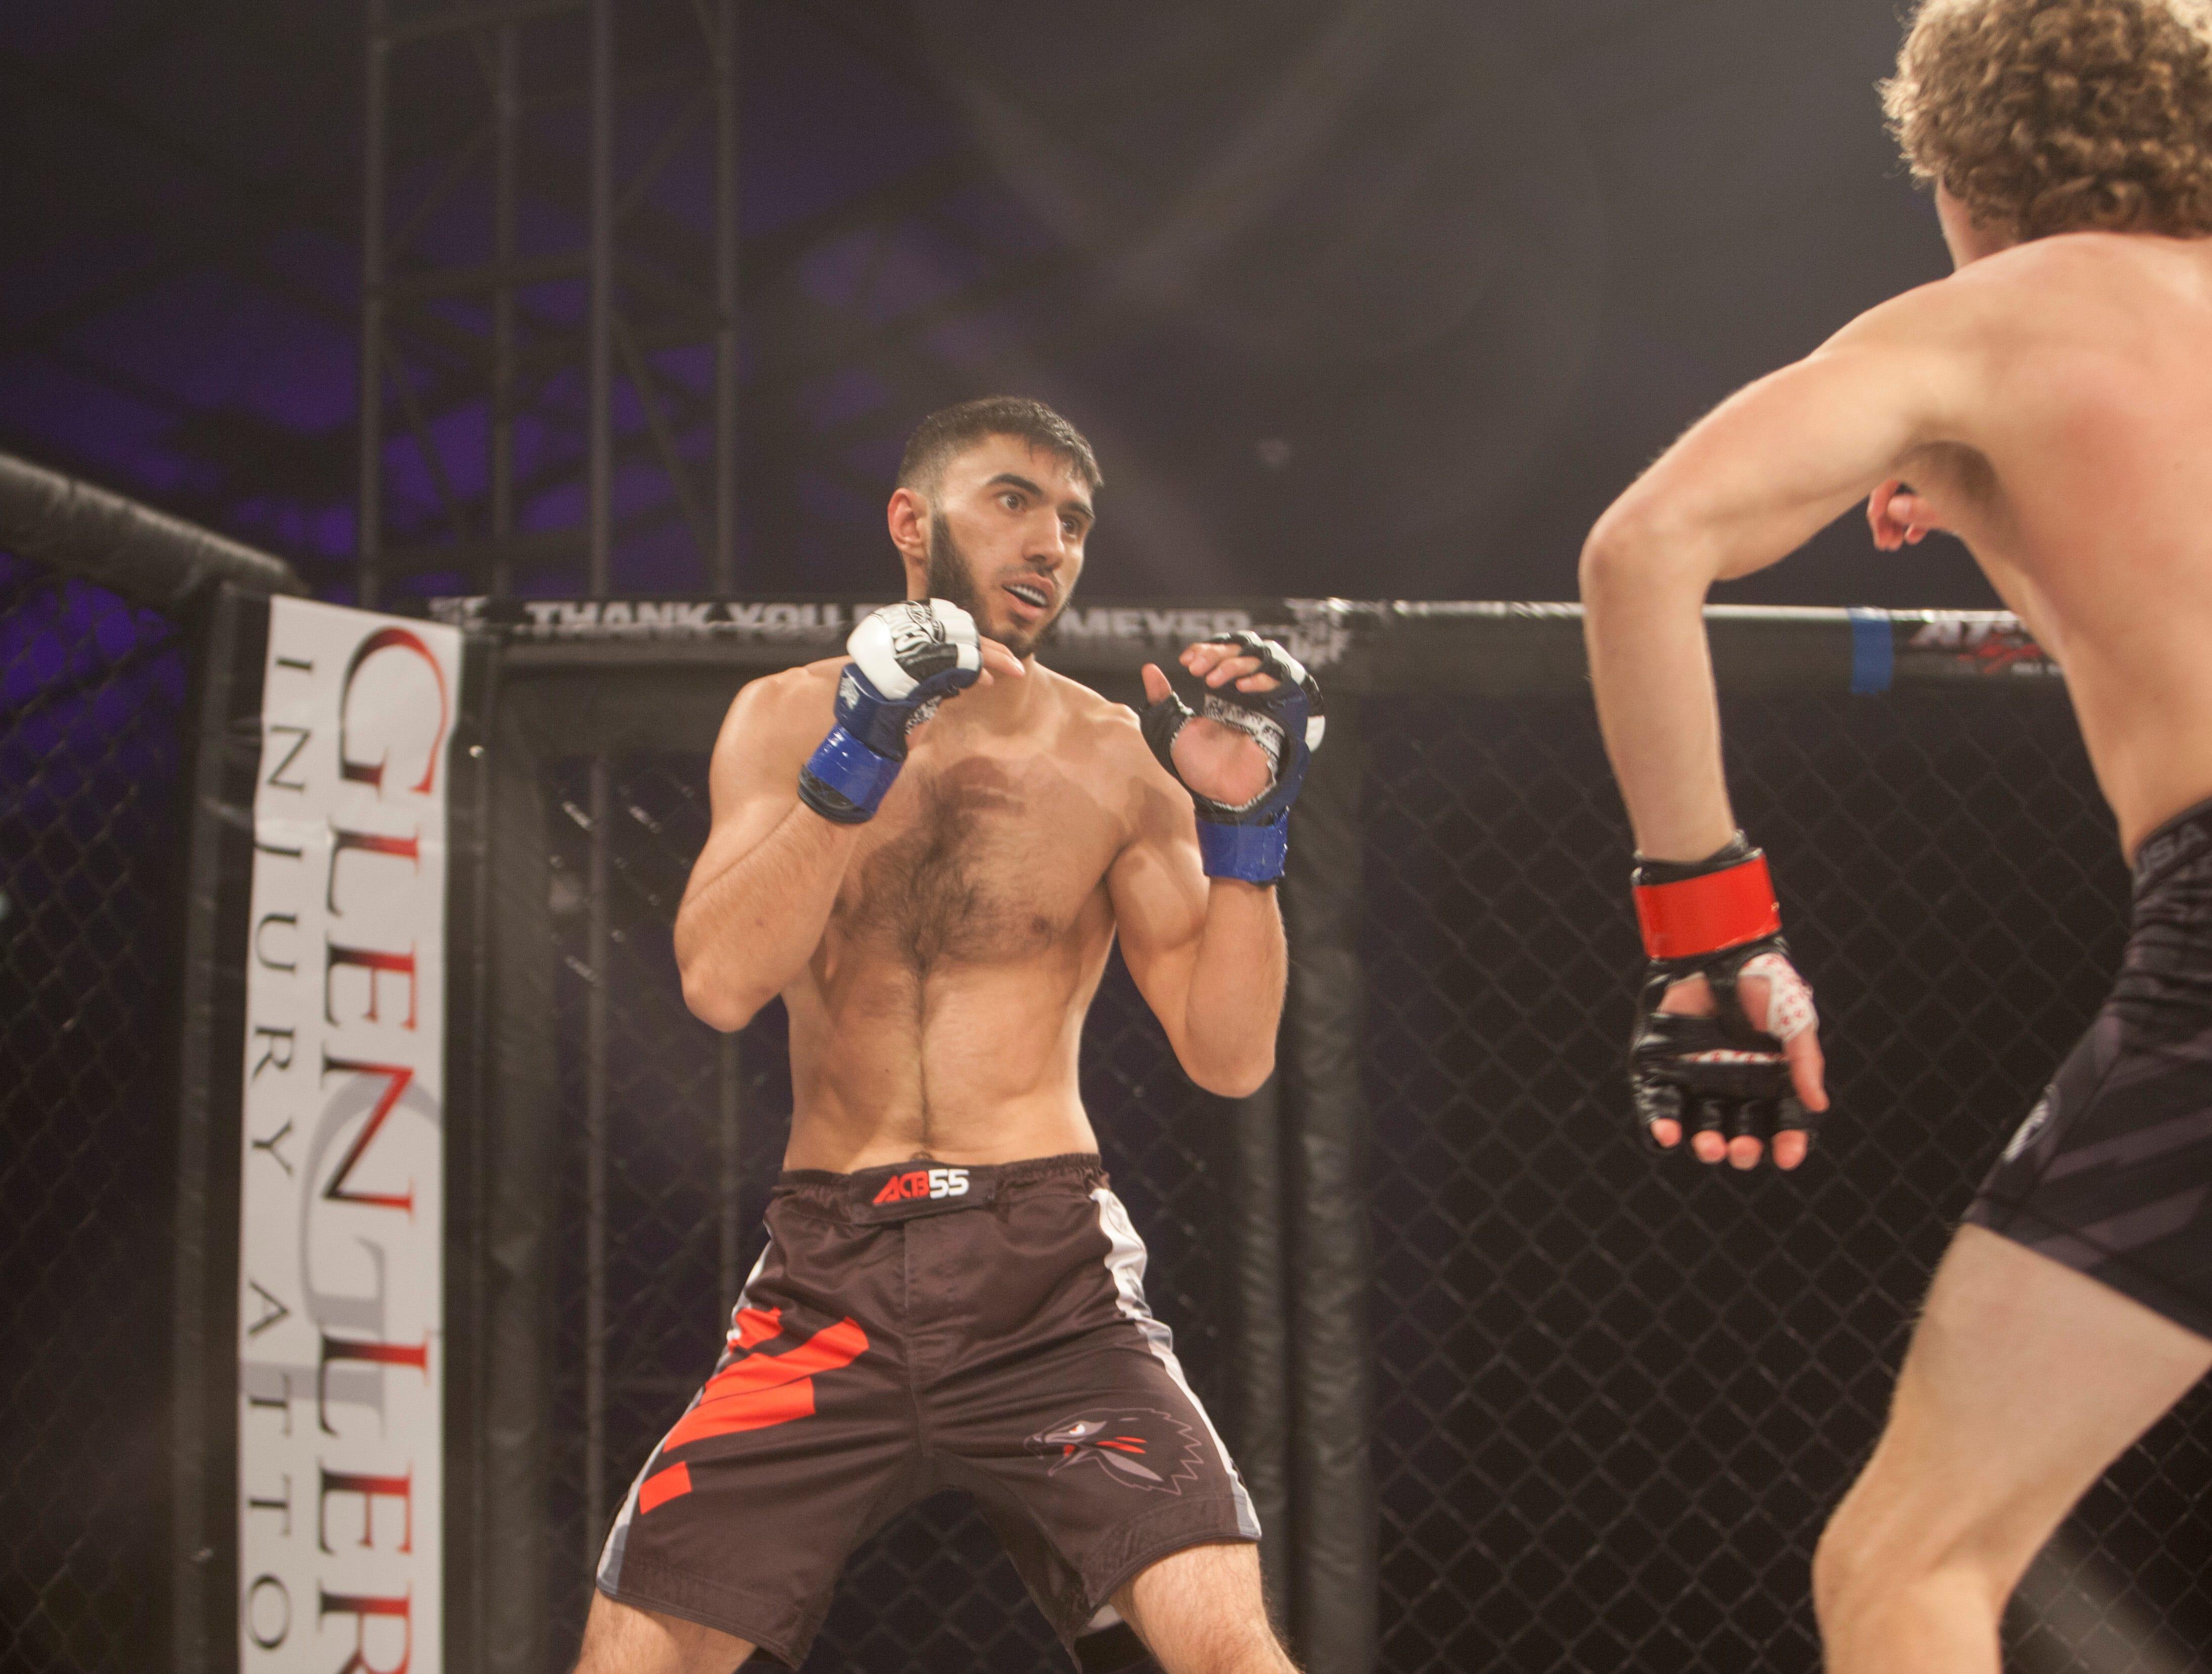 Eraj Aliev, in the blue corner, defeats Hyrum Labaron during Mayhem in Mesquite at the Casablanca Saturday, Dec. 15, 2018.